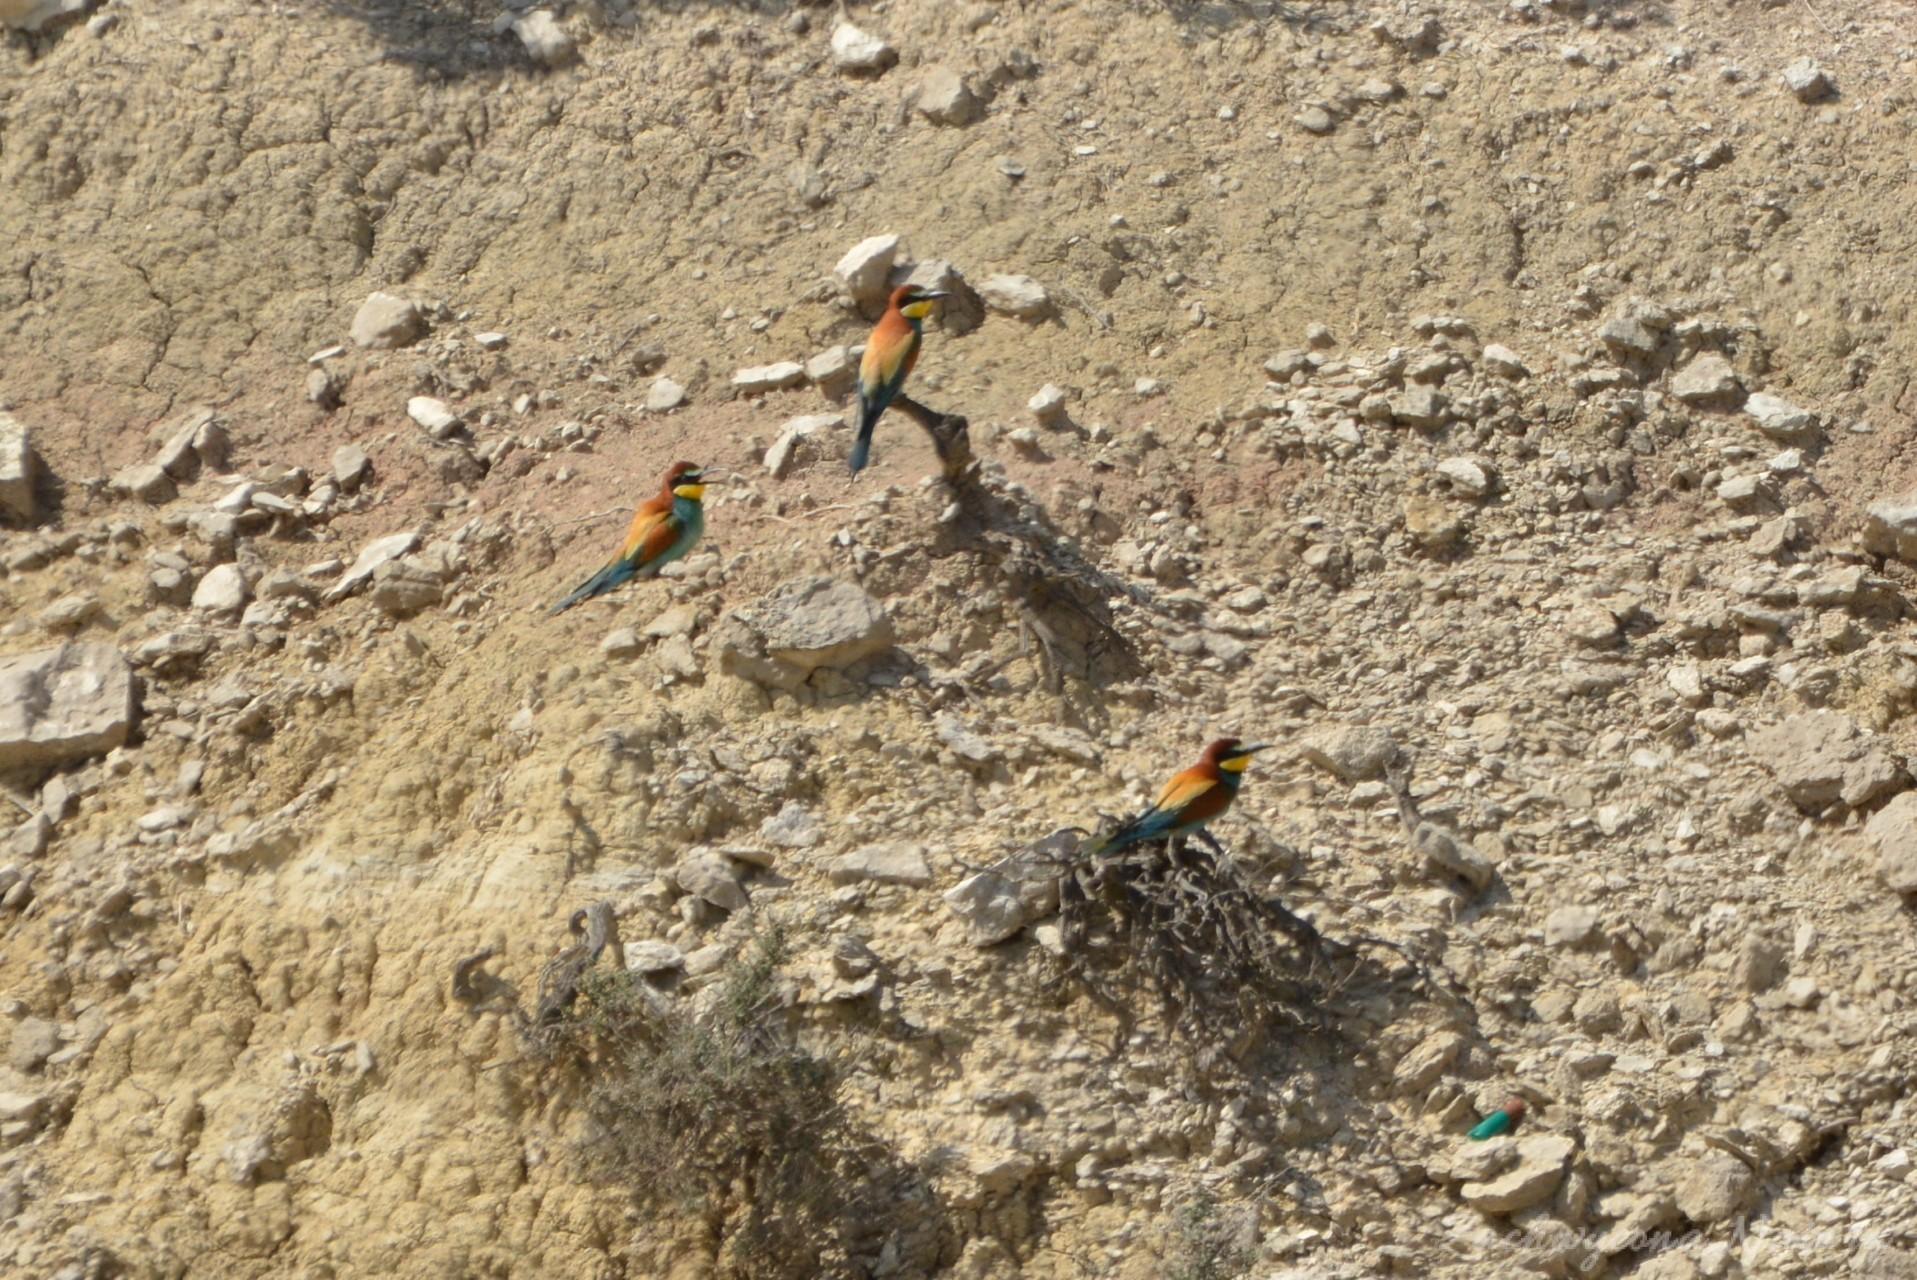 zolna-kolorowa-jak-papuga-merops-apiaster-bee-eater-5